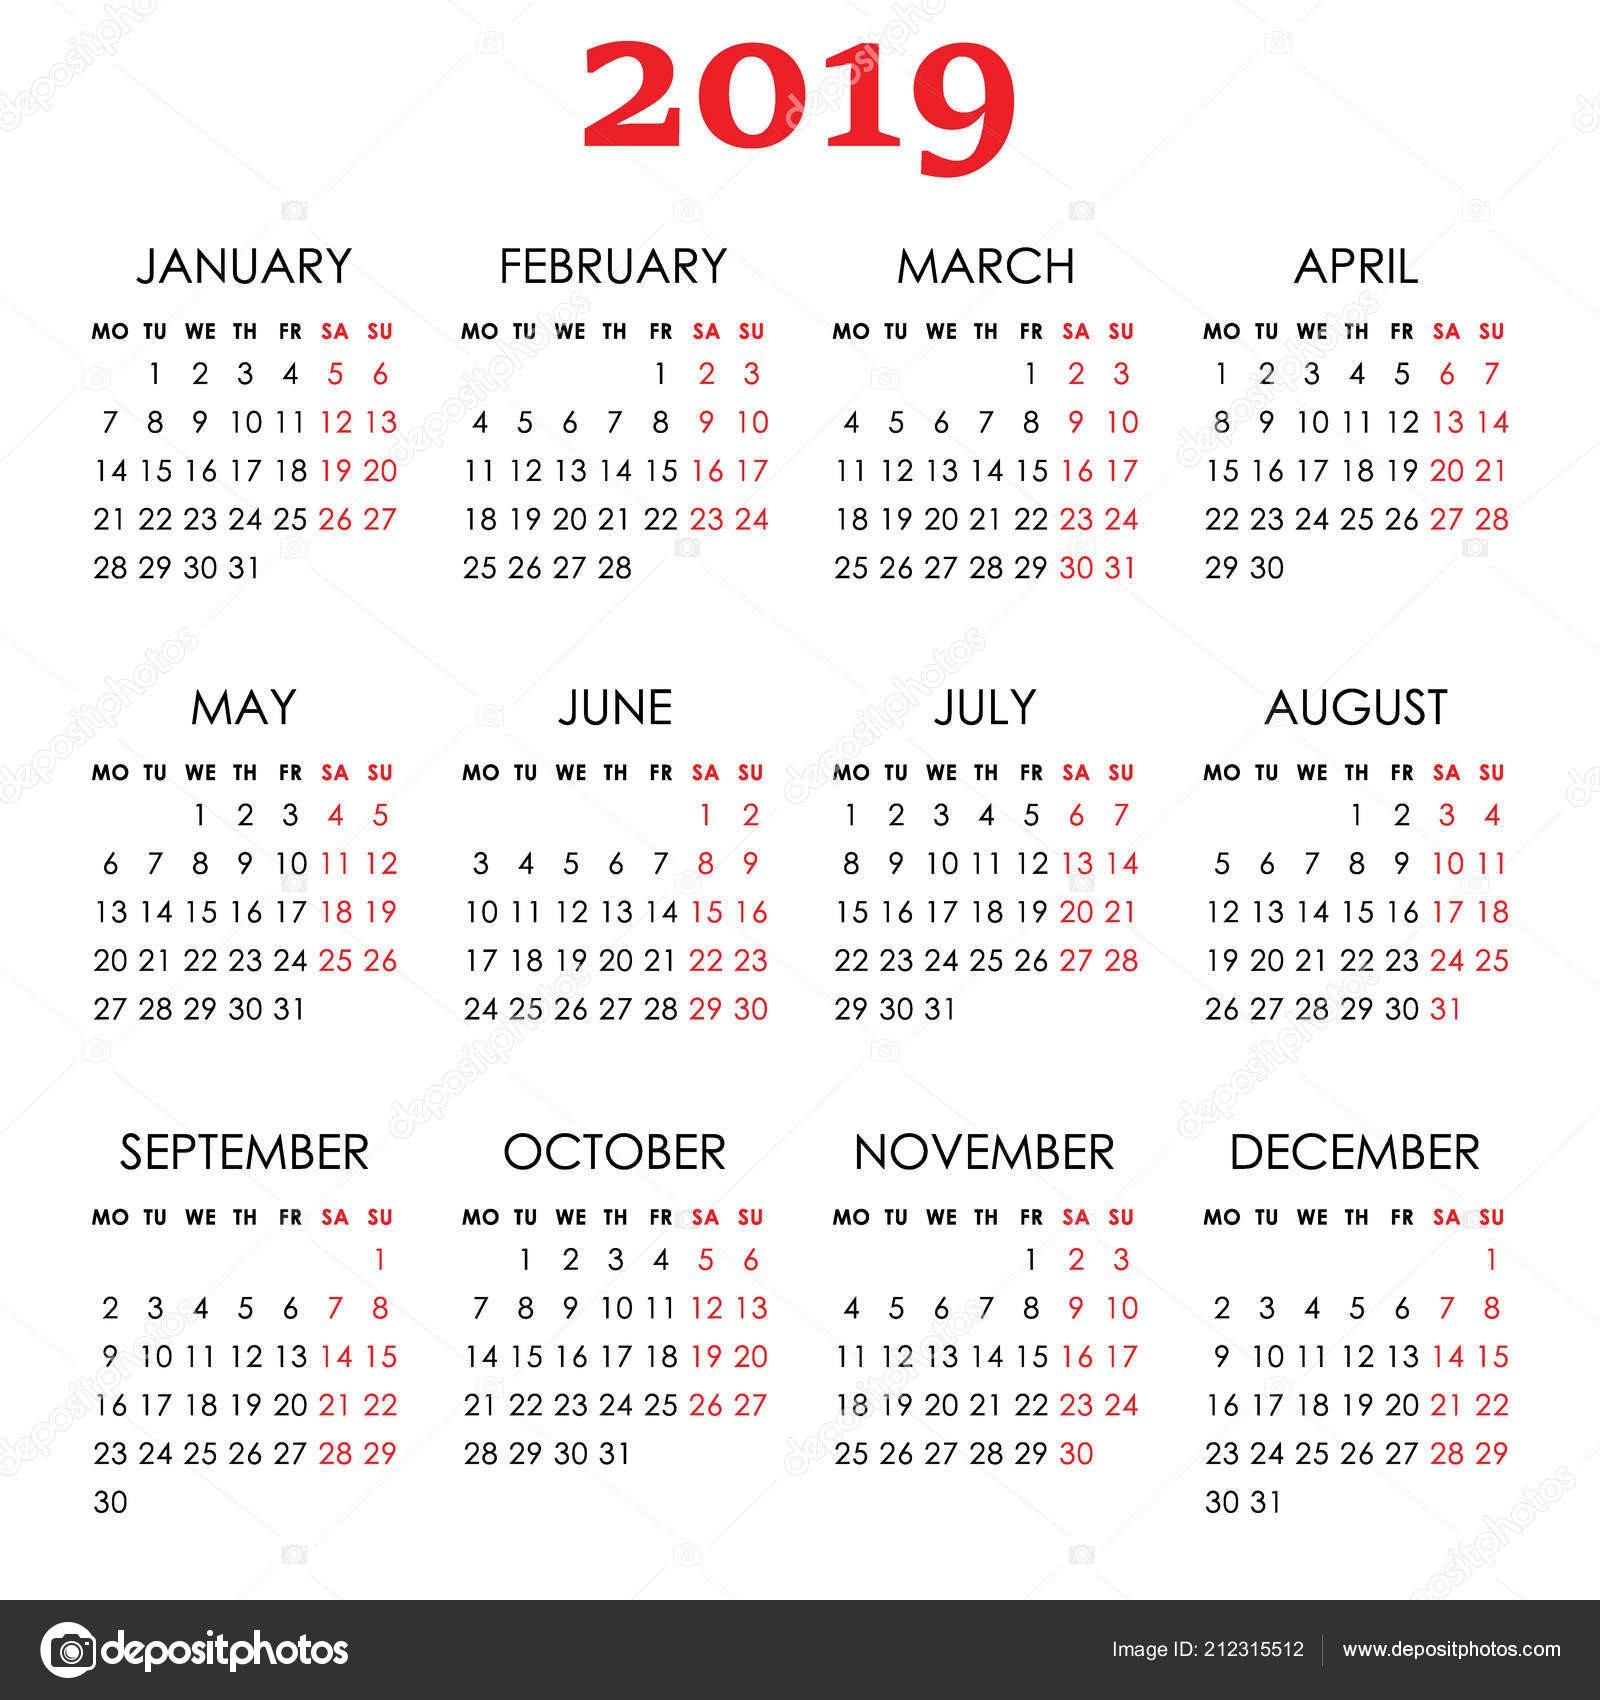 depositphotos stock illustration simple calendar for 2019 year